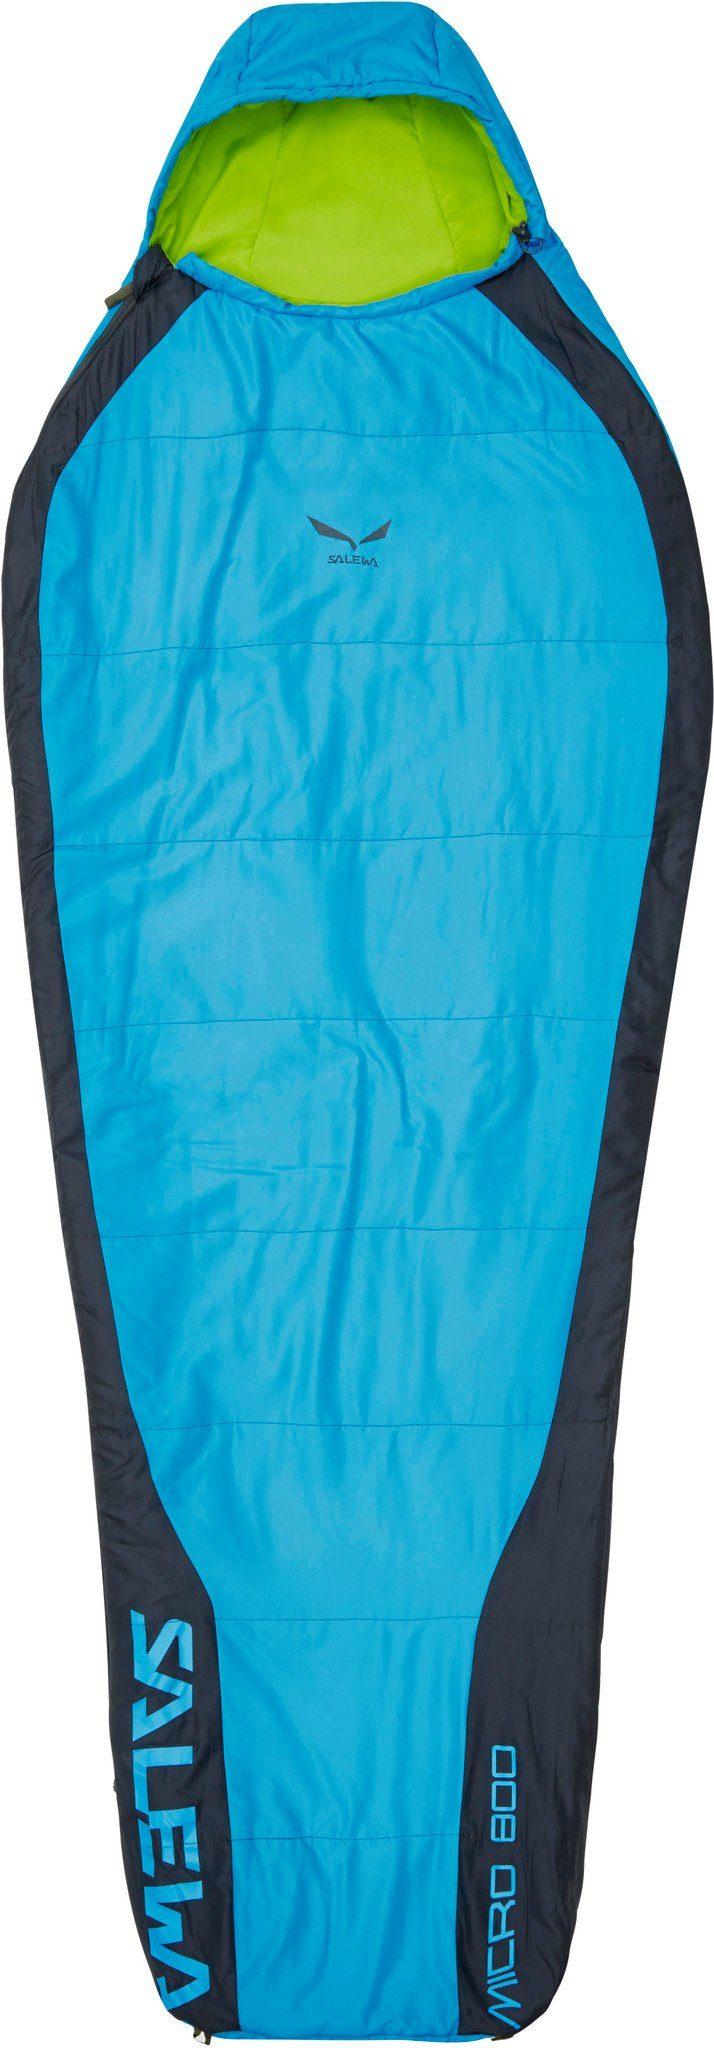 Salewa Wanderrucksack »Micro 800 Sleeping Bag«